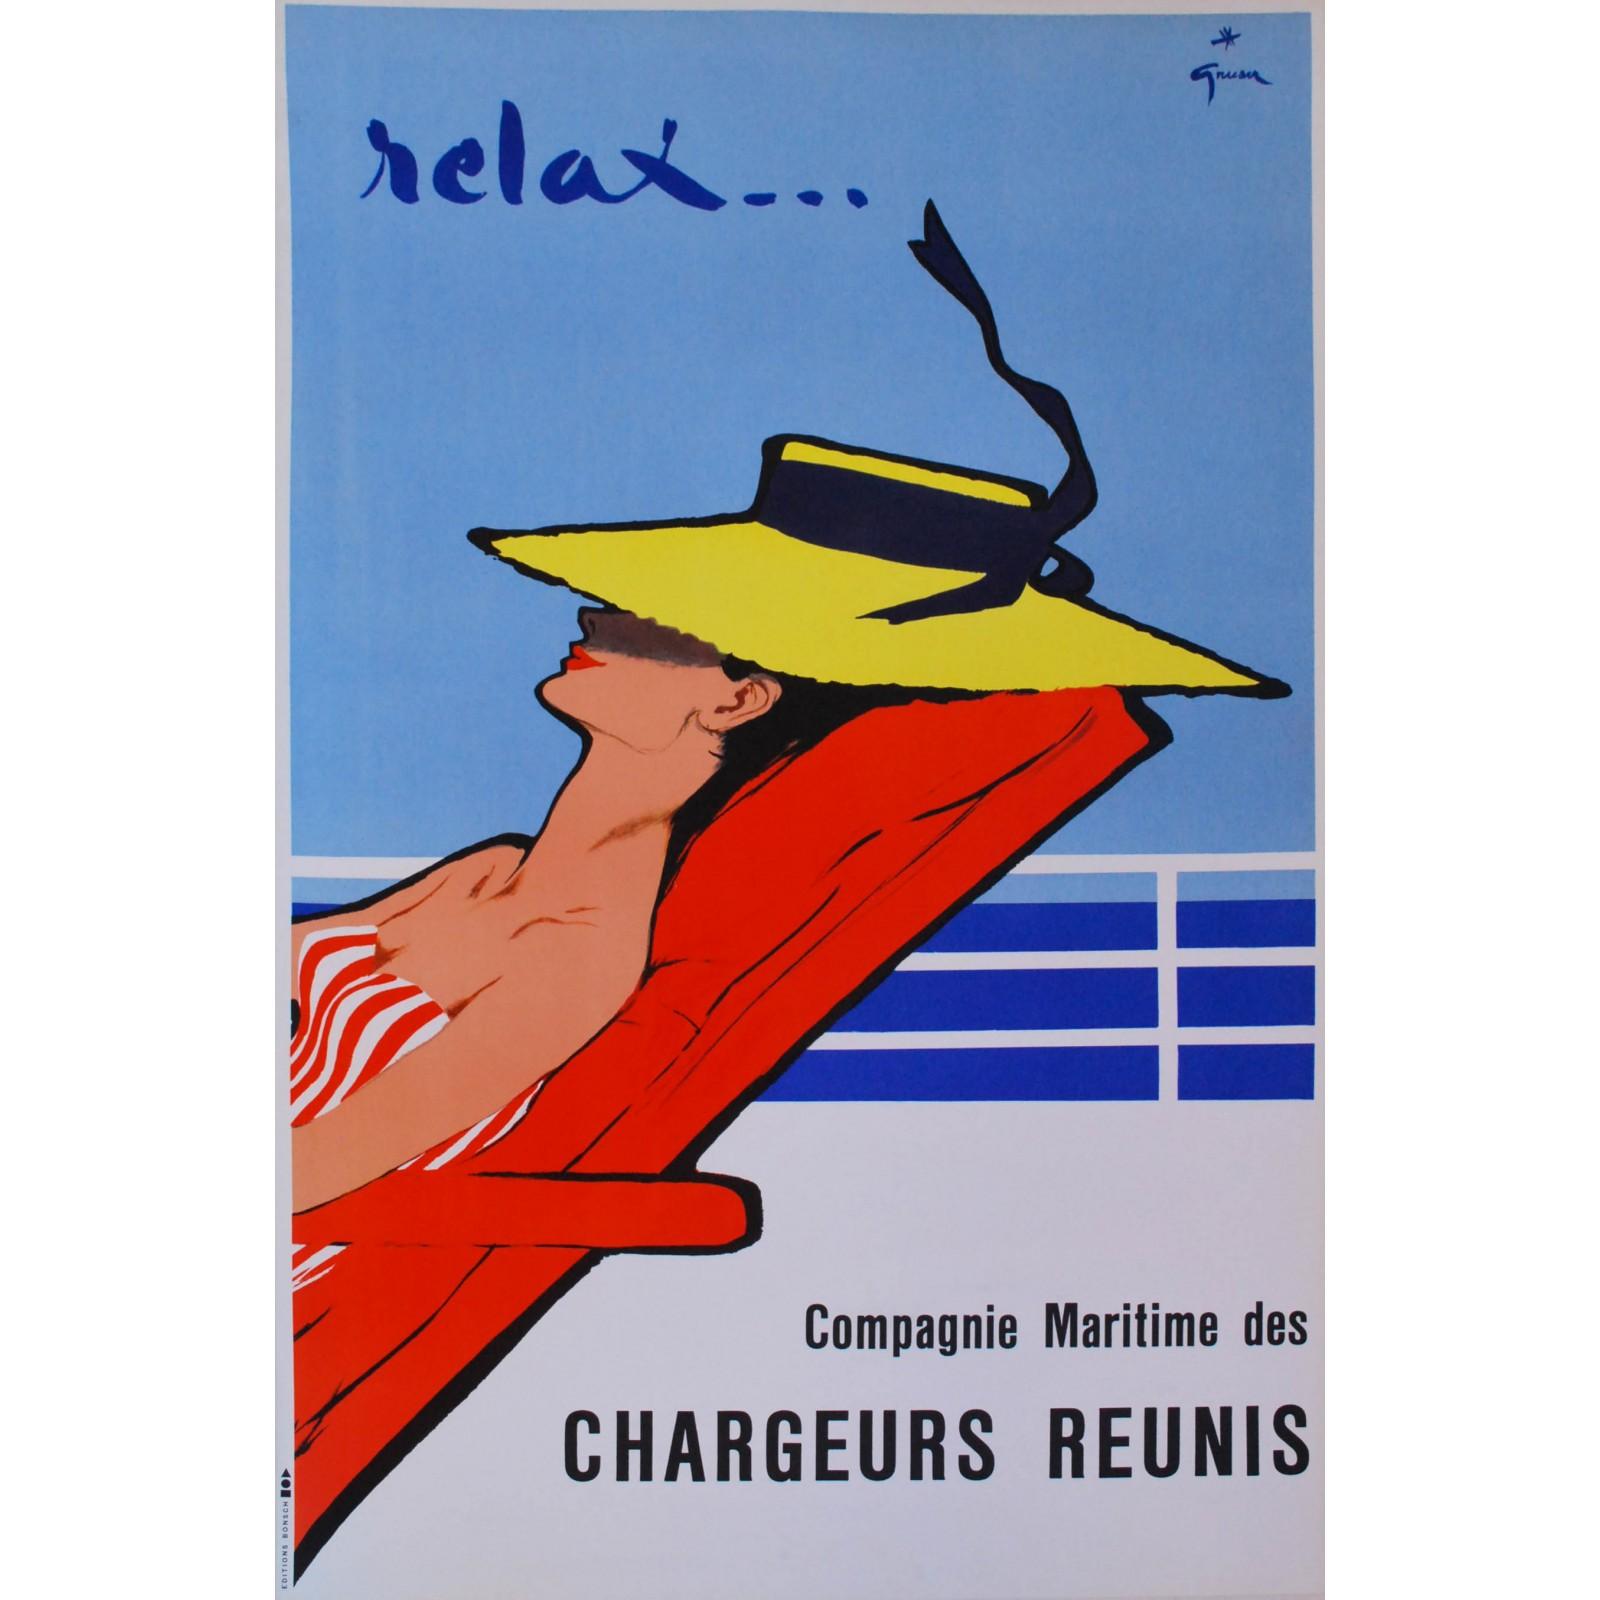 ren gruau chargeurs r unis vers 1950 posters we love. Black Bedroom Furniture Sets. Home Design Ideas